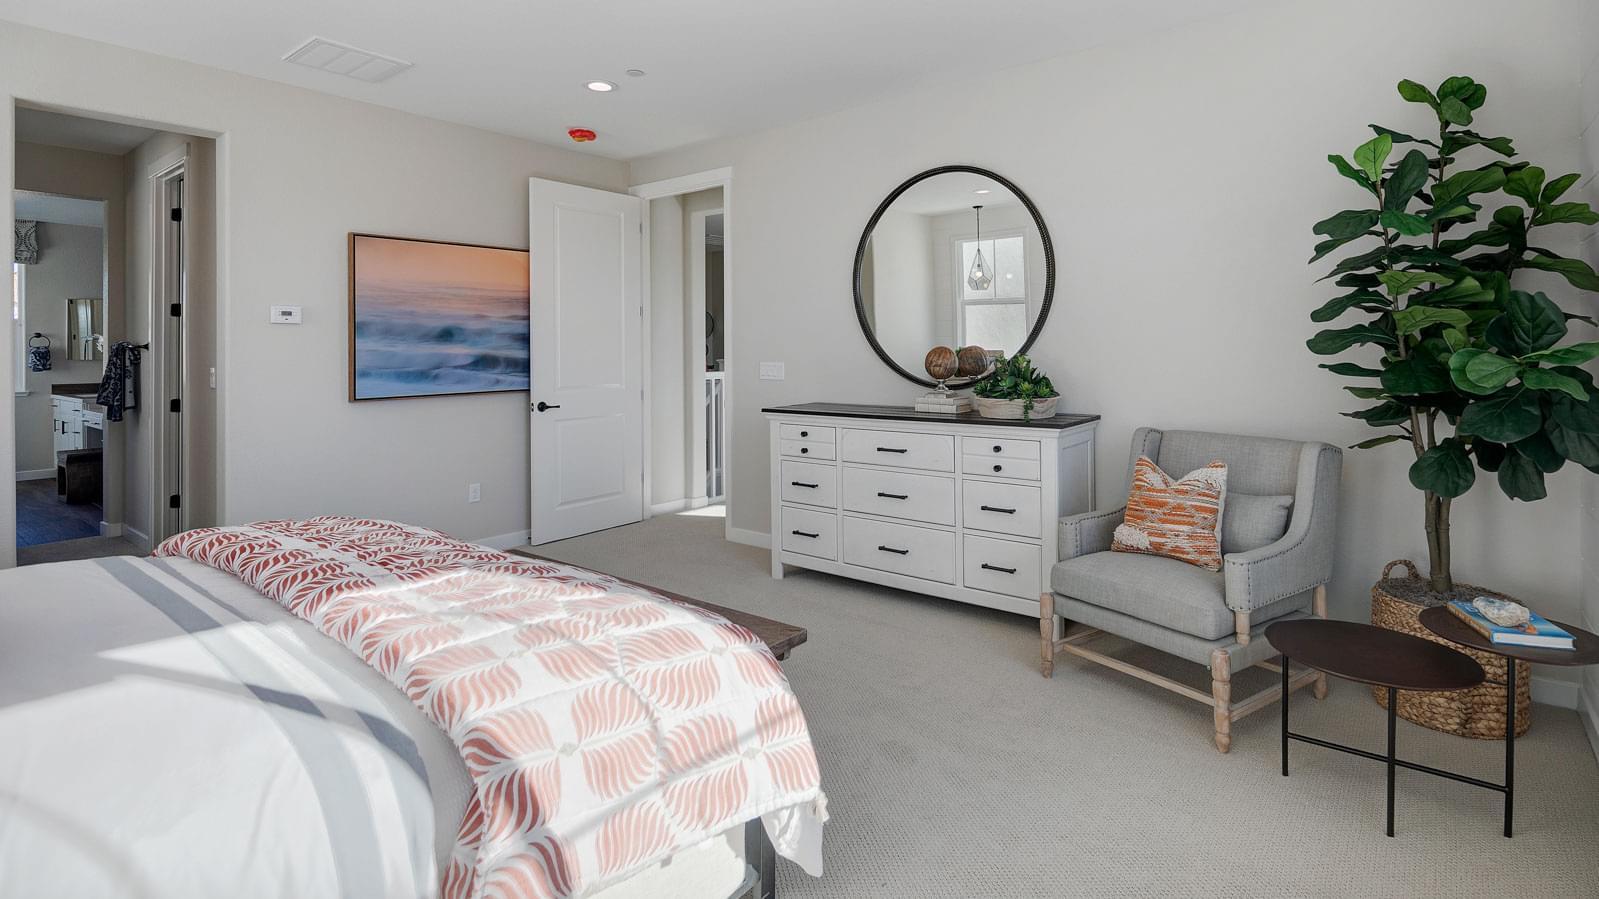 Residence 2 Master Bedroom